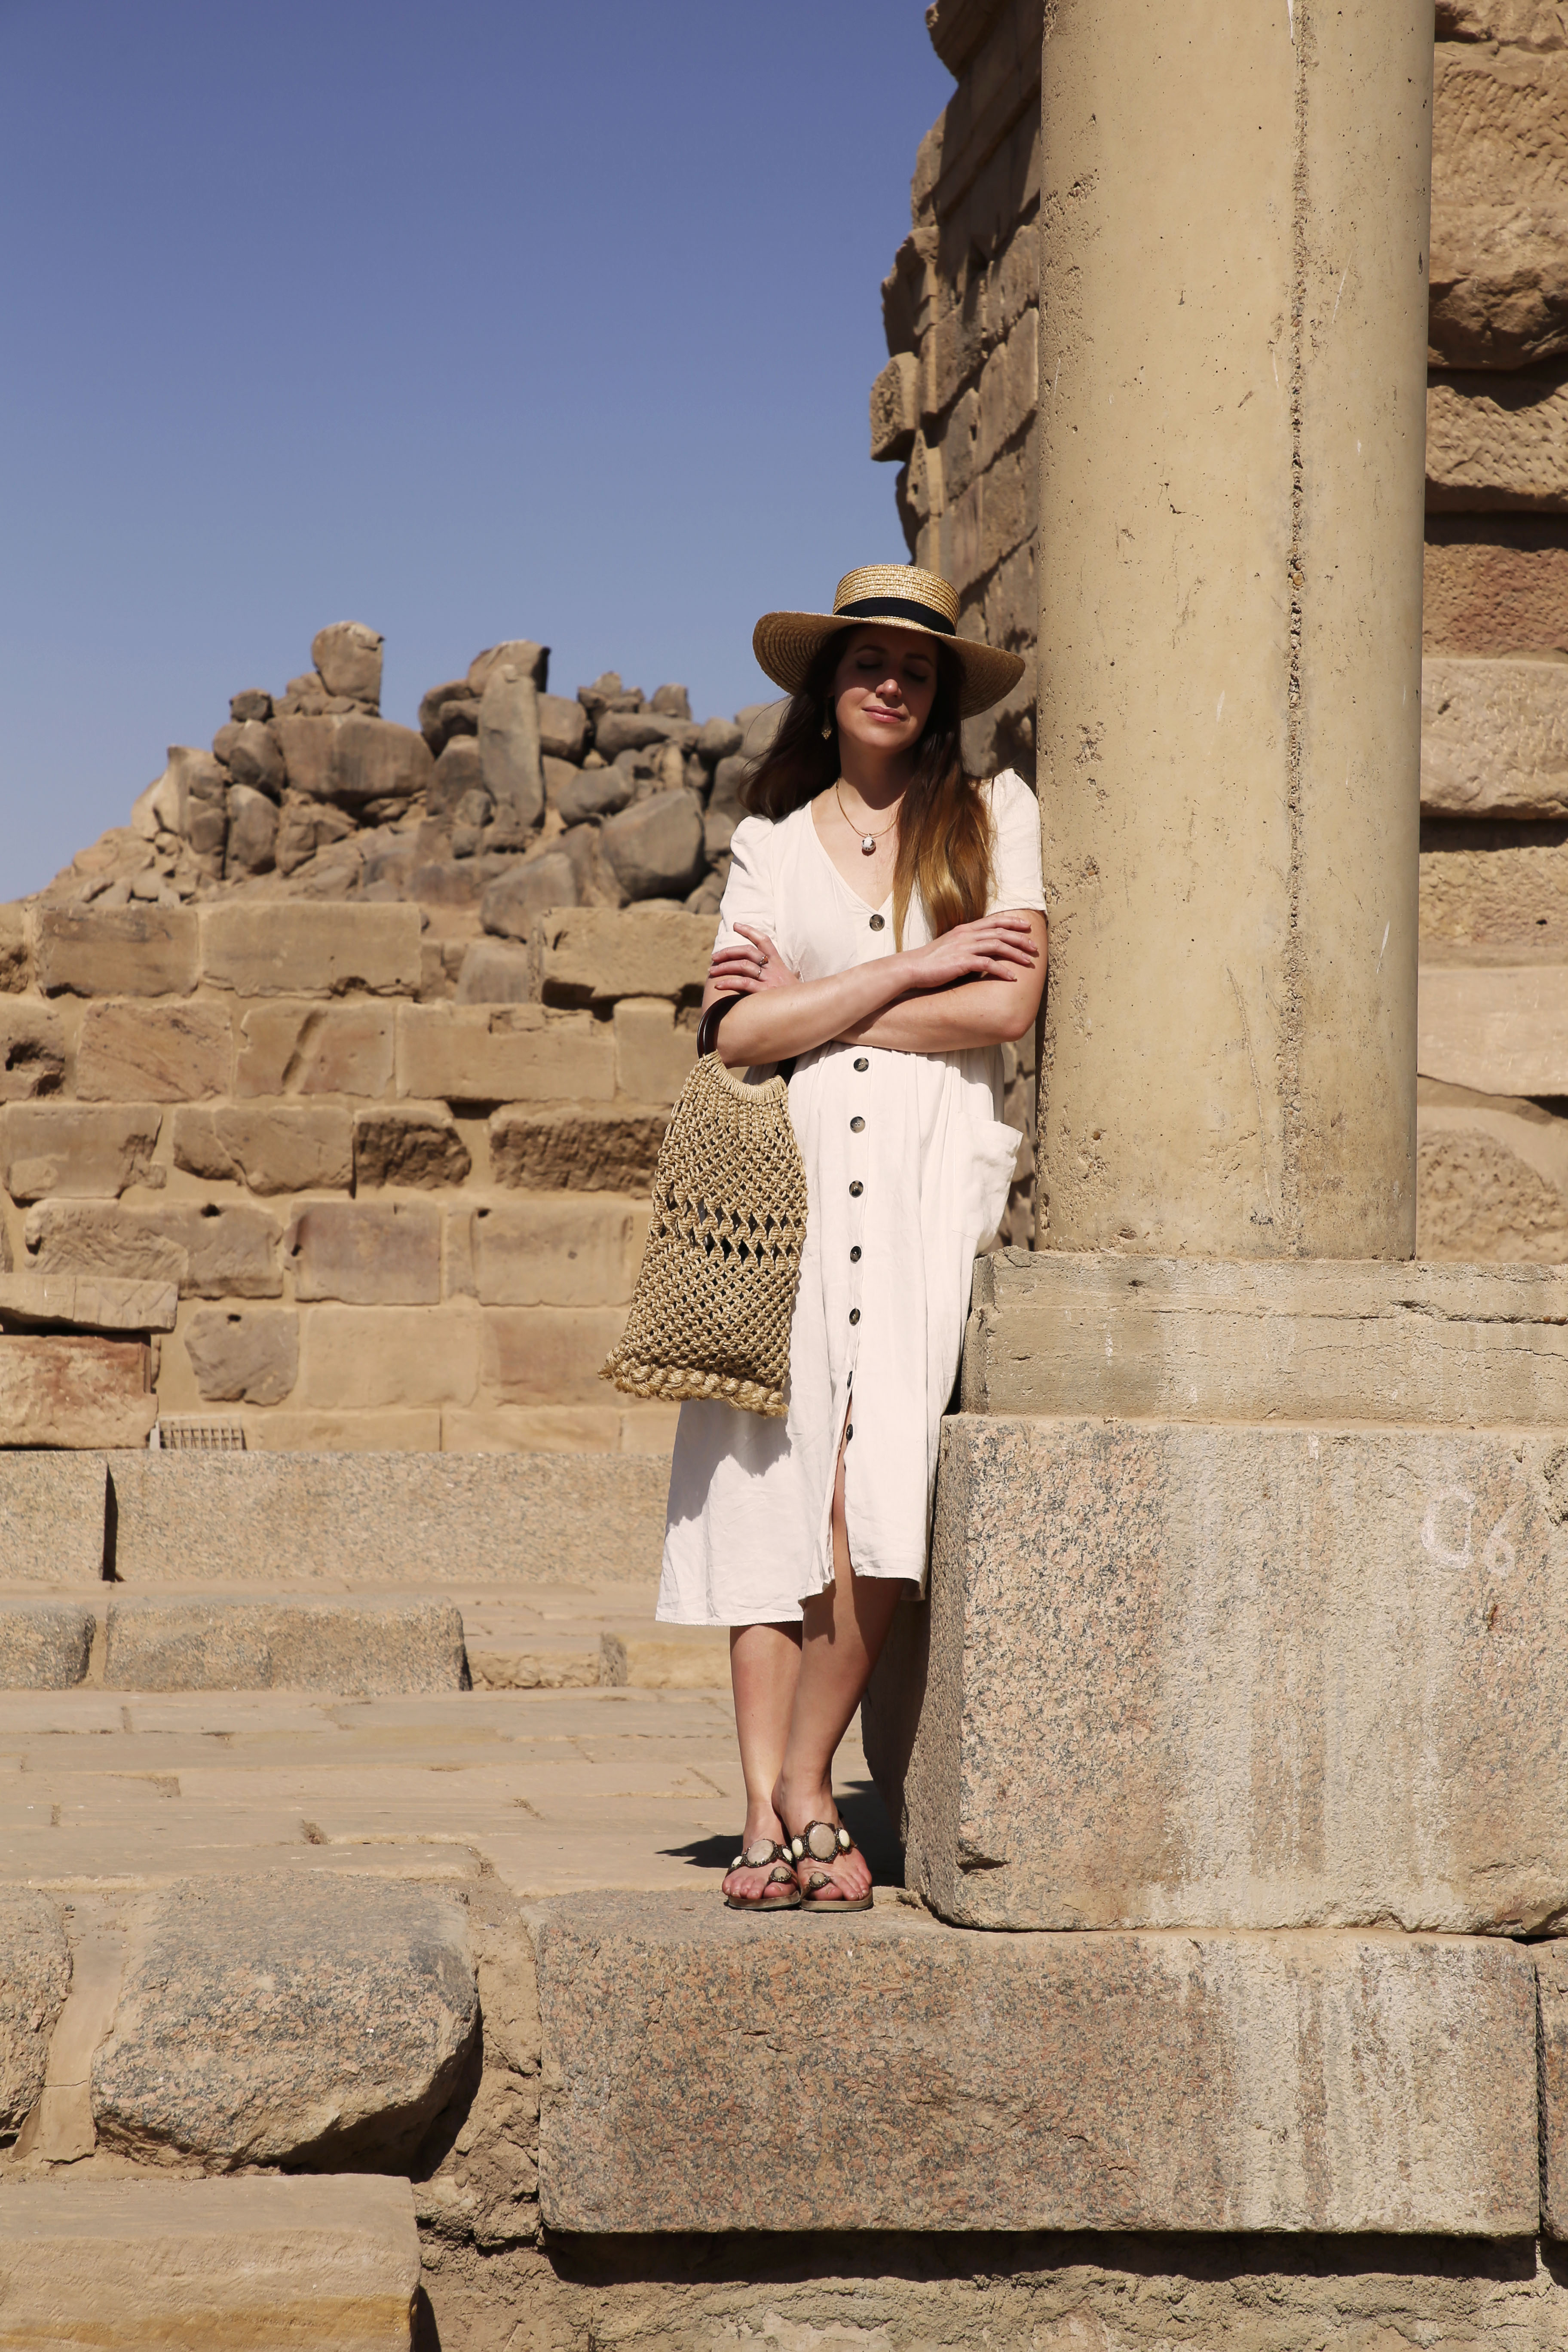 mia und ich blog Philea Tempel Ägypten Egypt